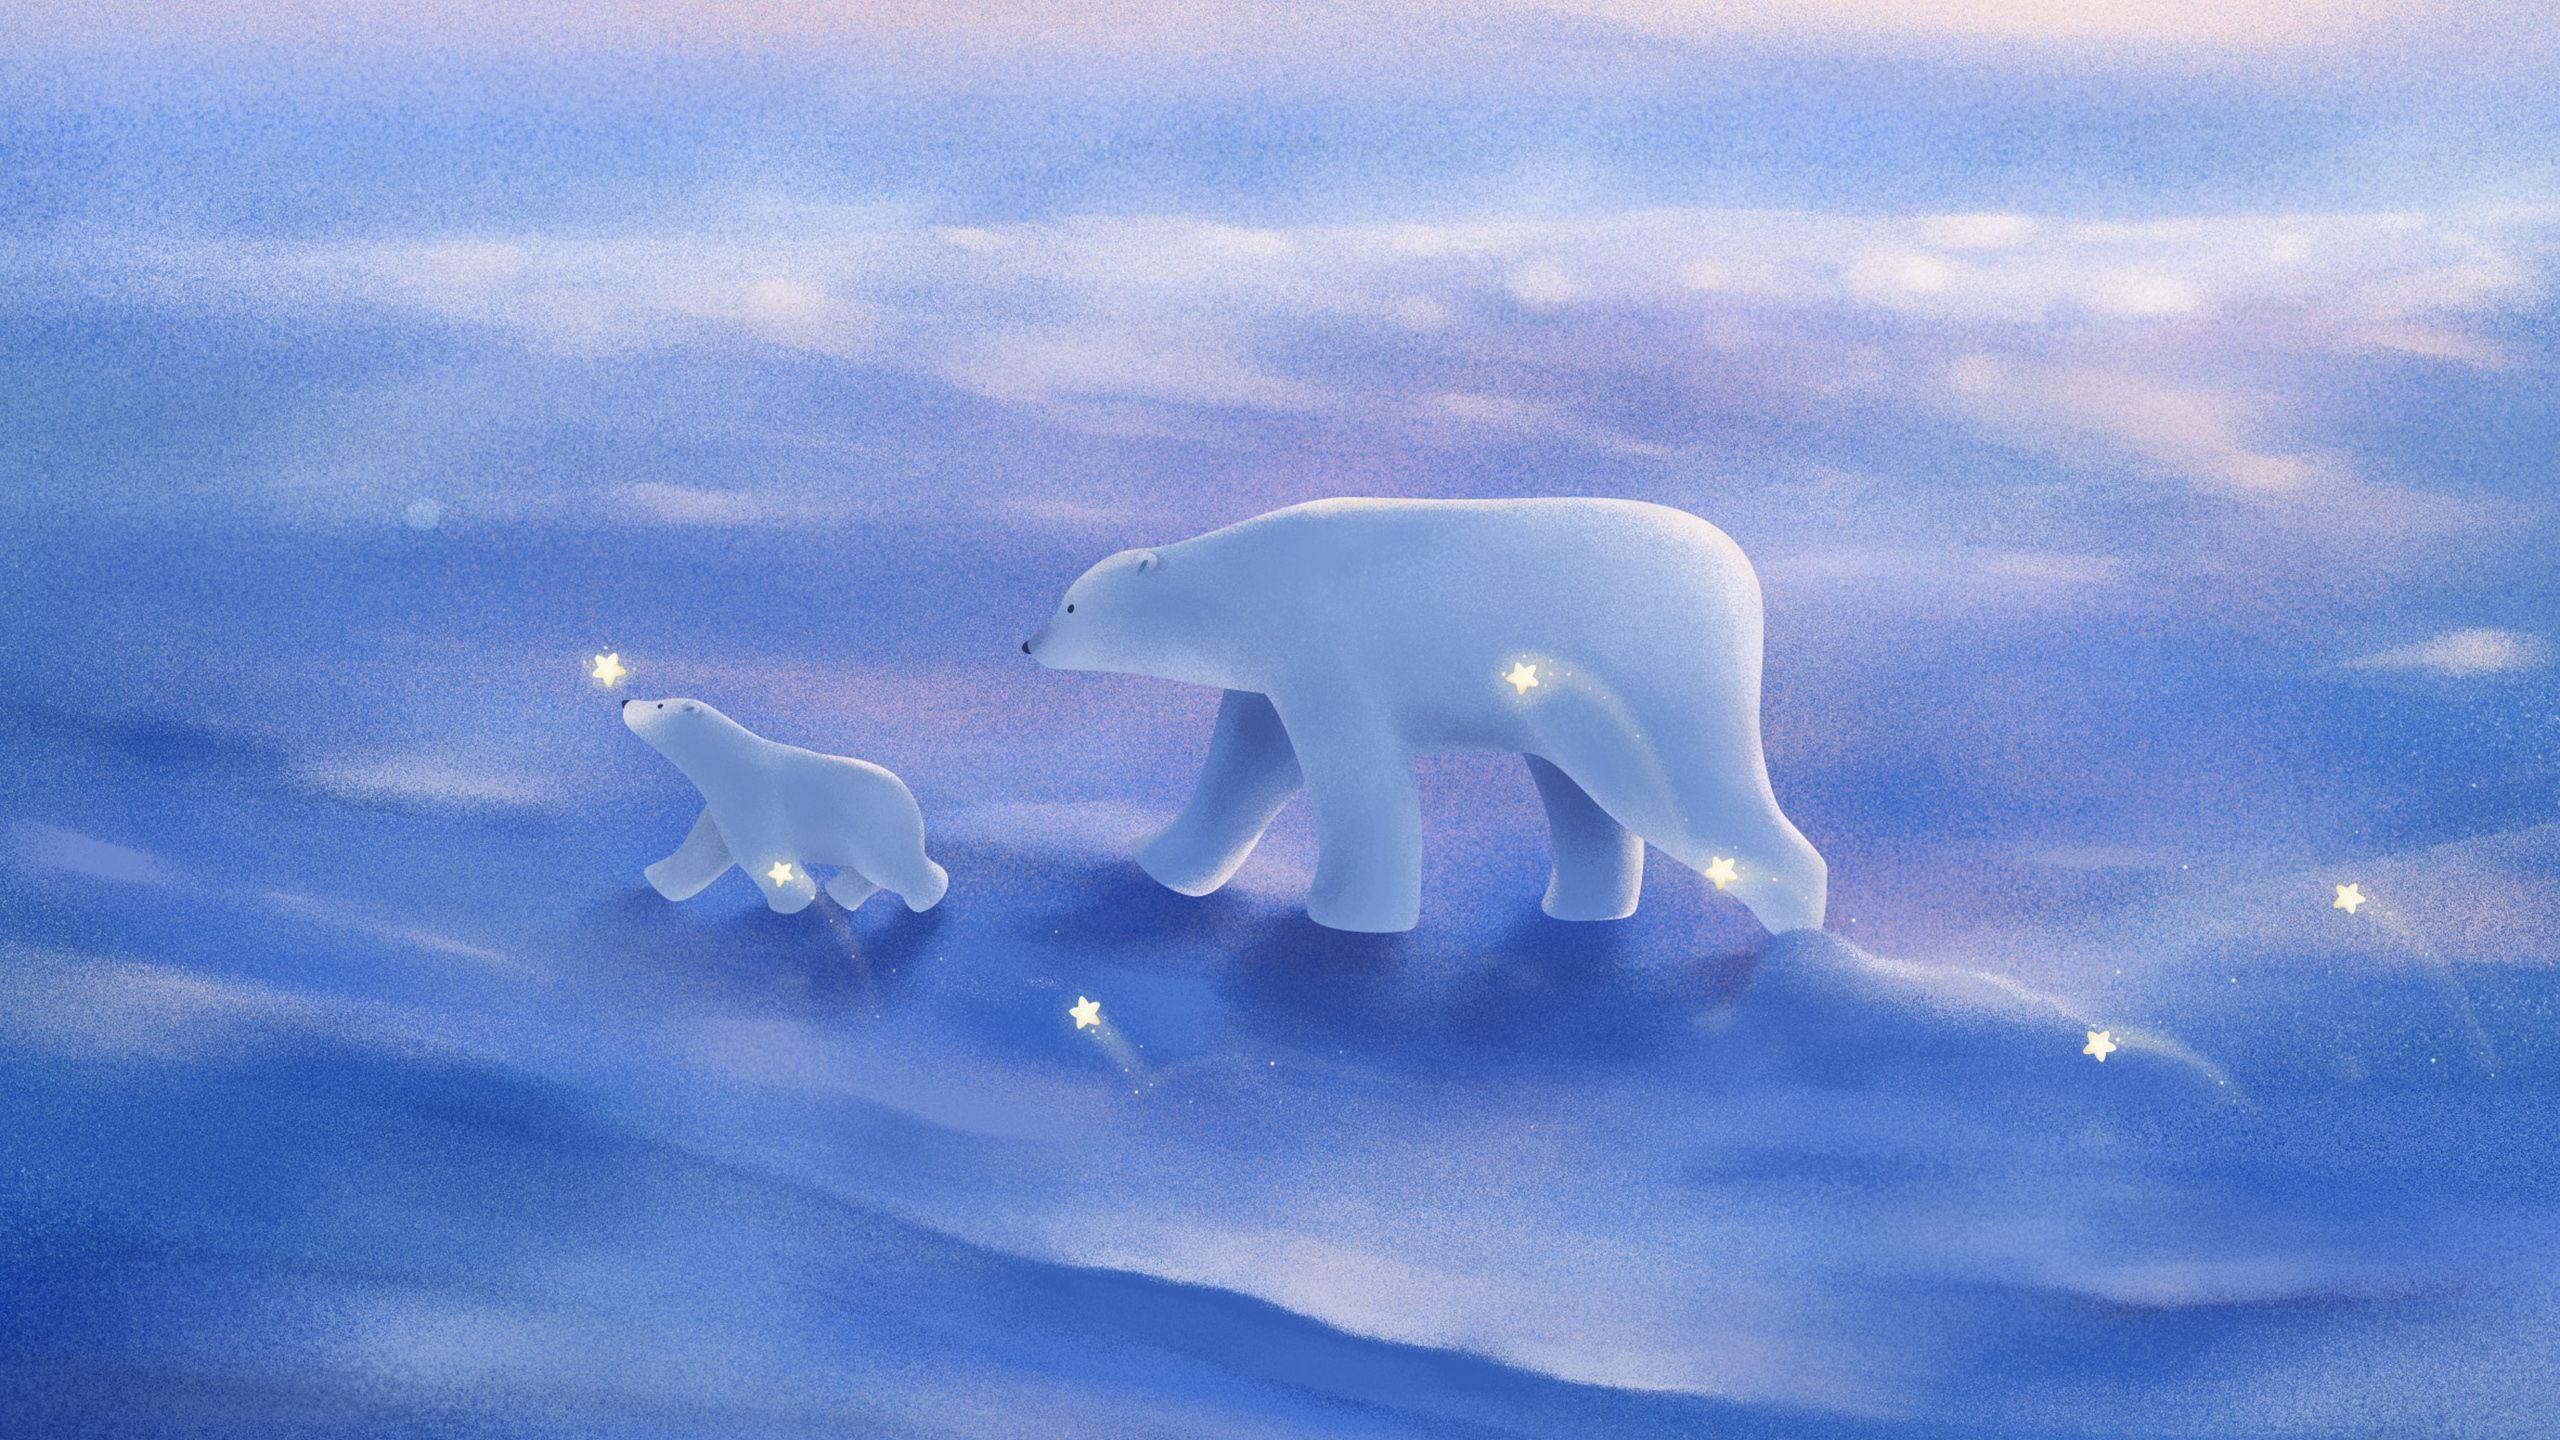 Polar Bears Wallpapers - Top Free Polar